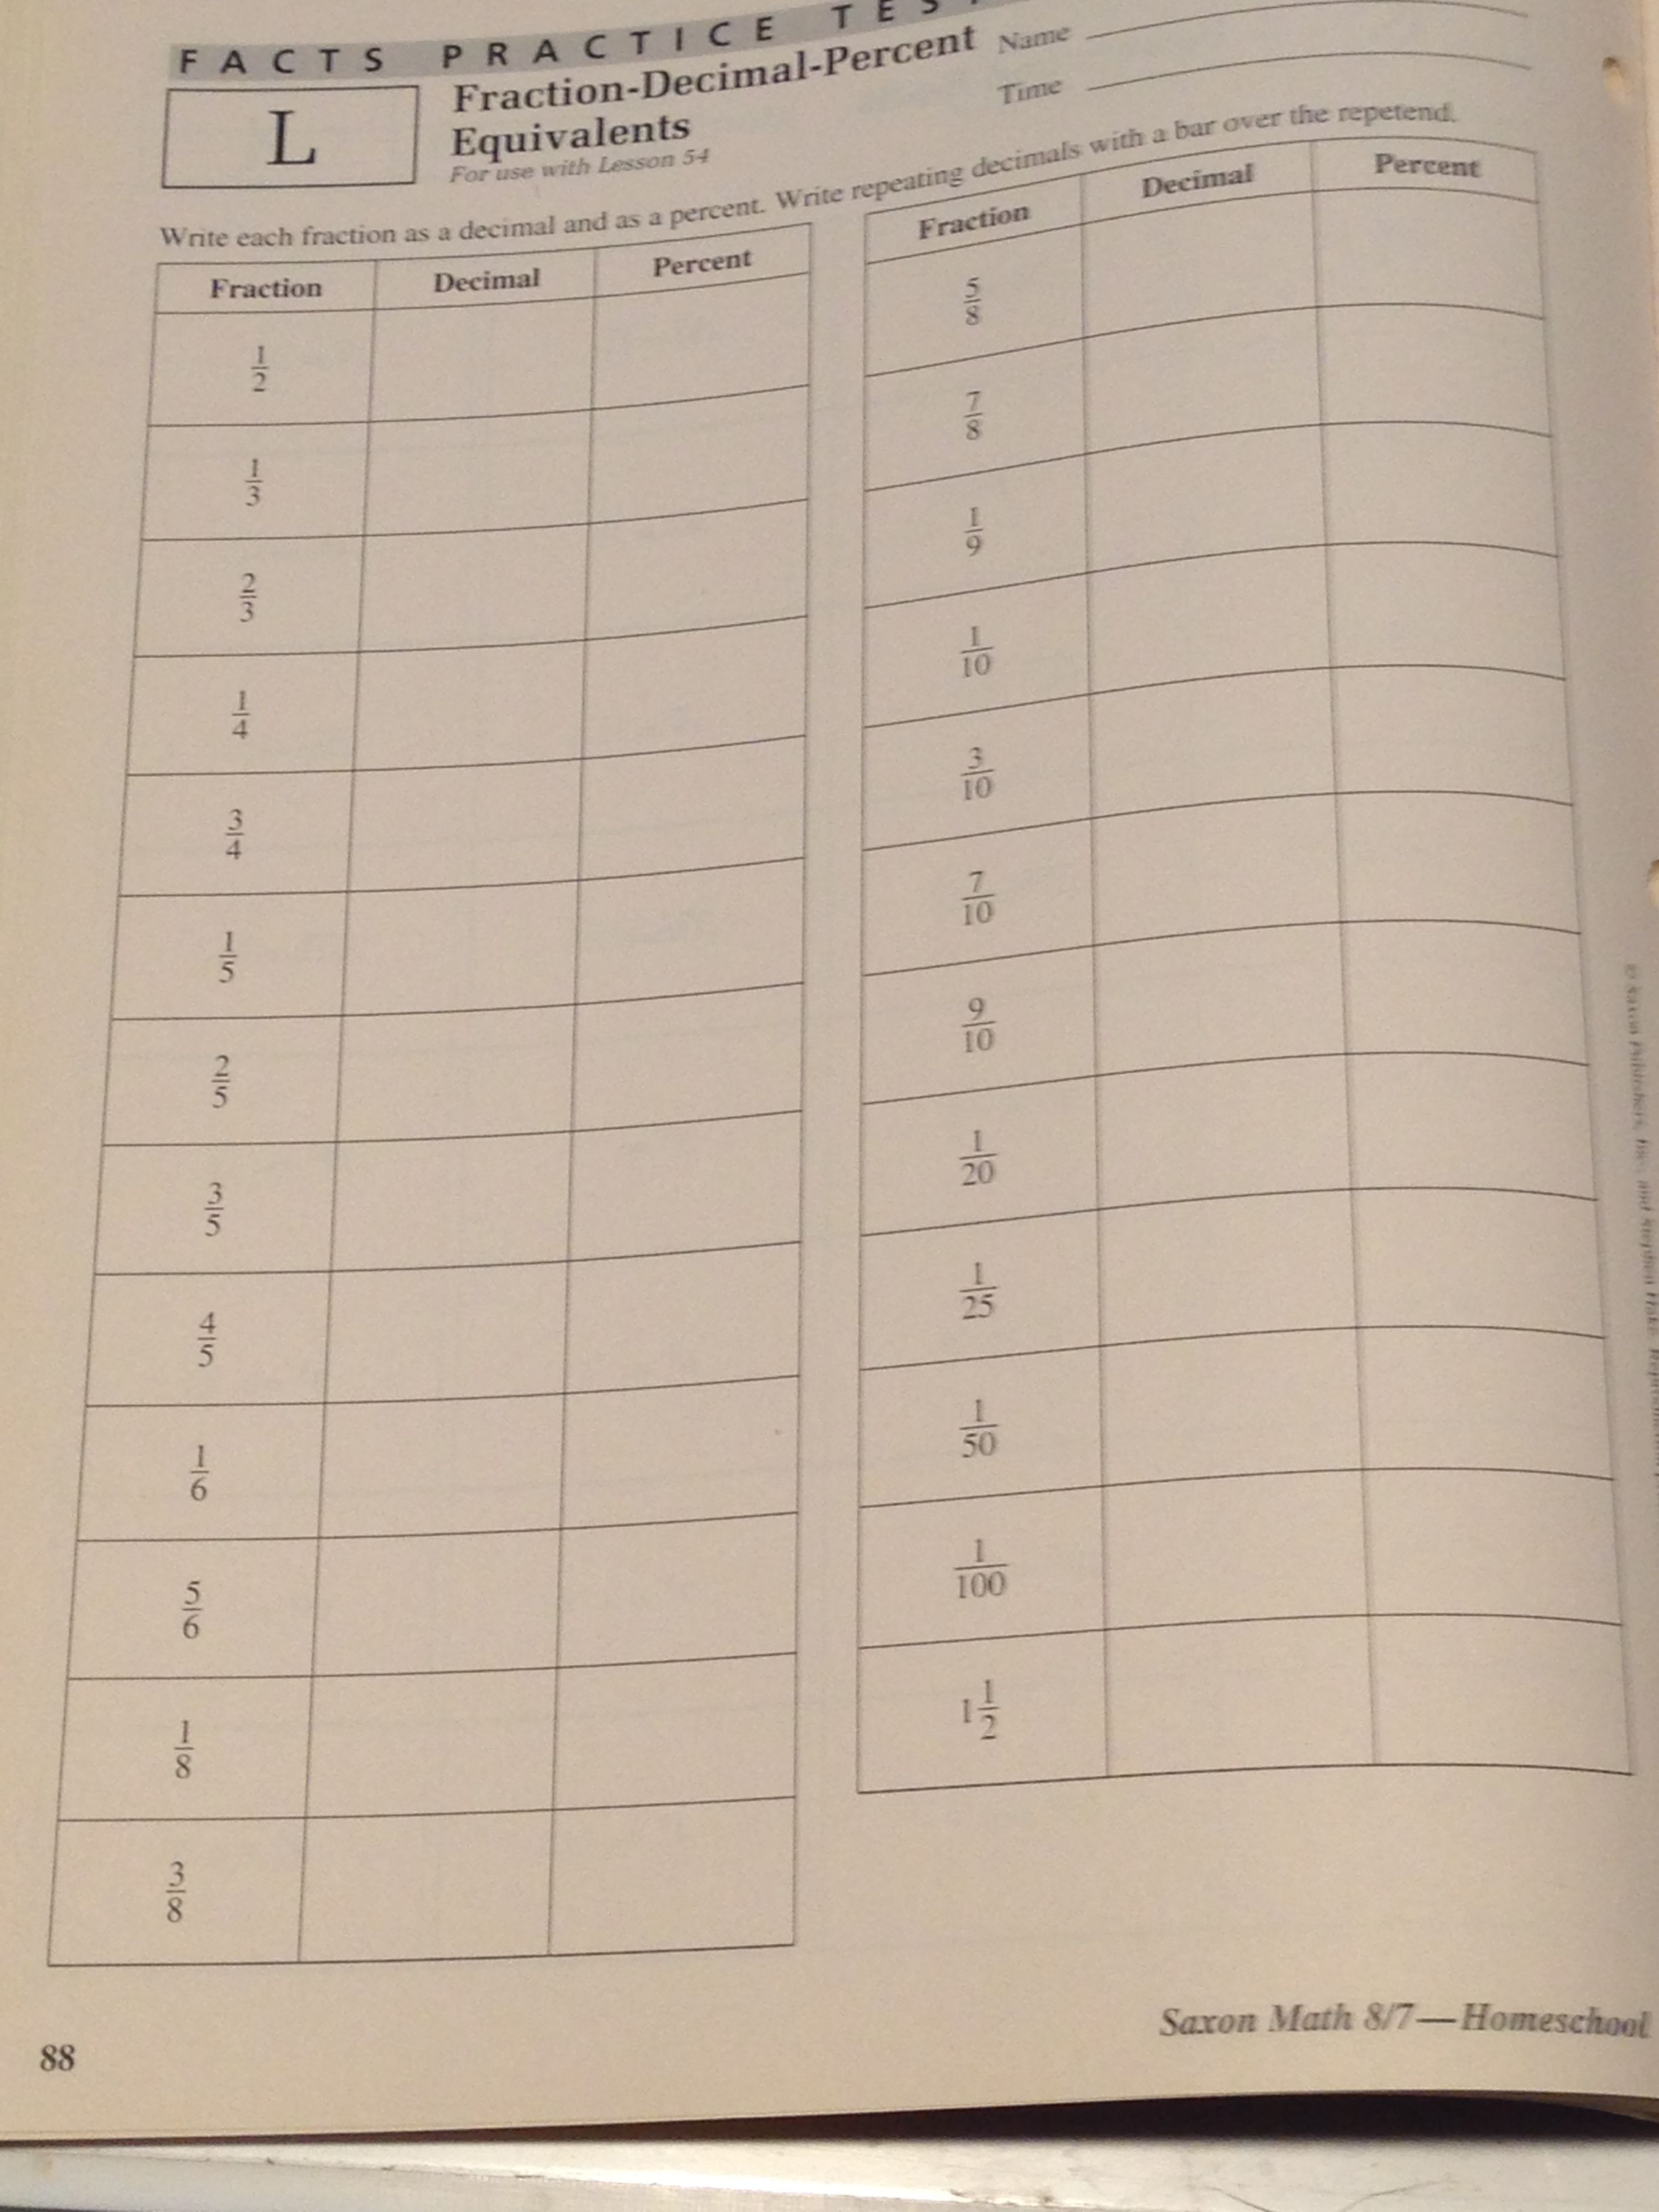 Should My Child Do Saxon Math 8 7 Or Algebra 1 2